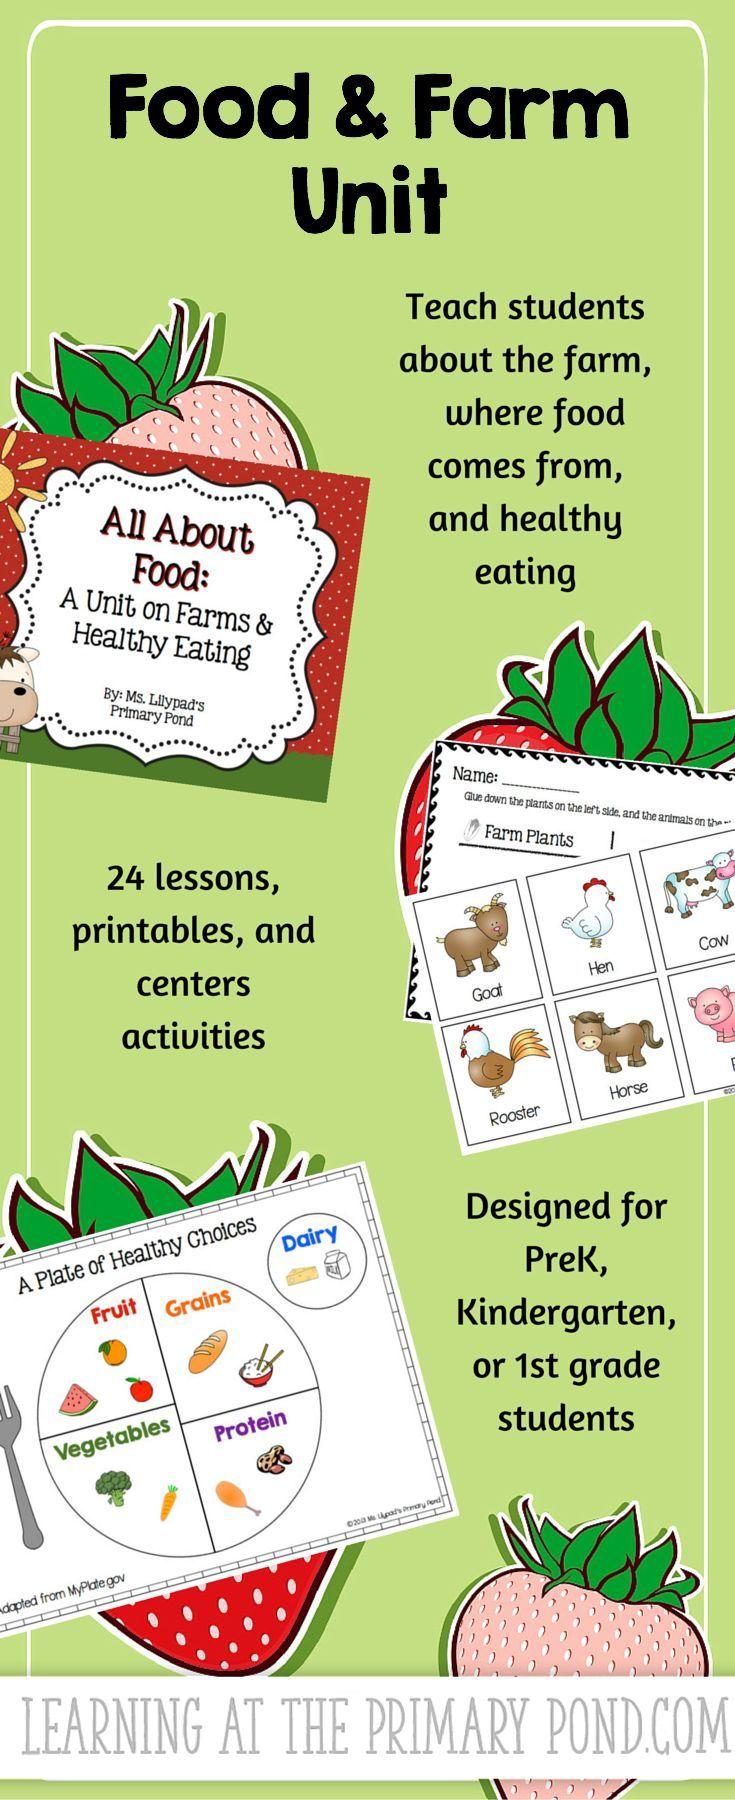 Farm and Food Unit for Preschool, Kindergarten, or First